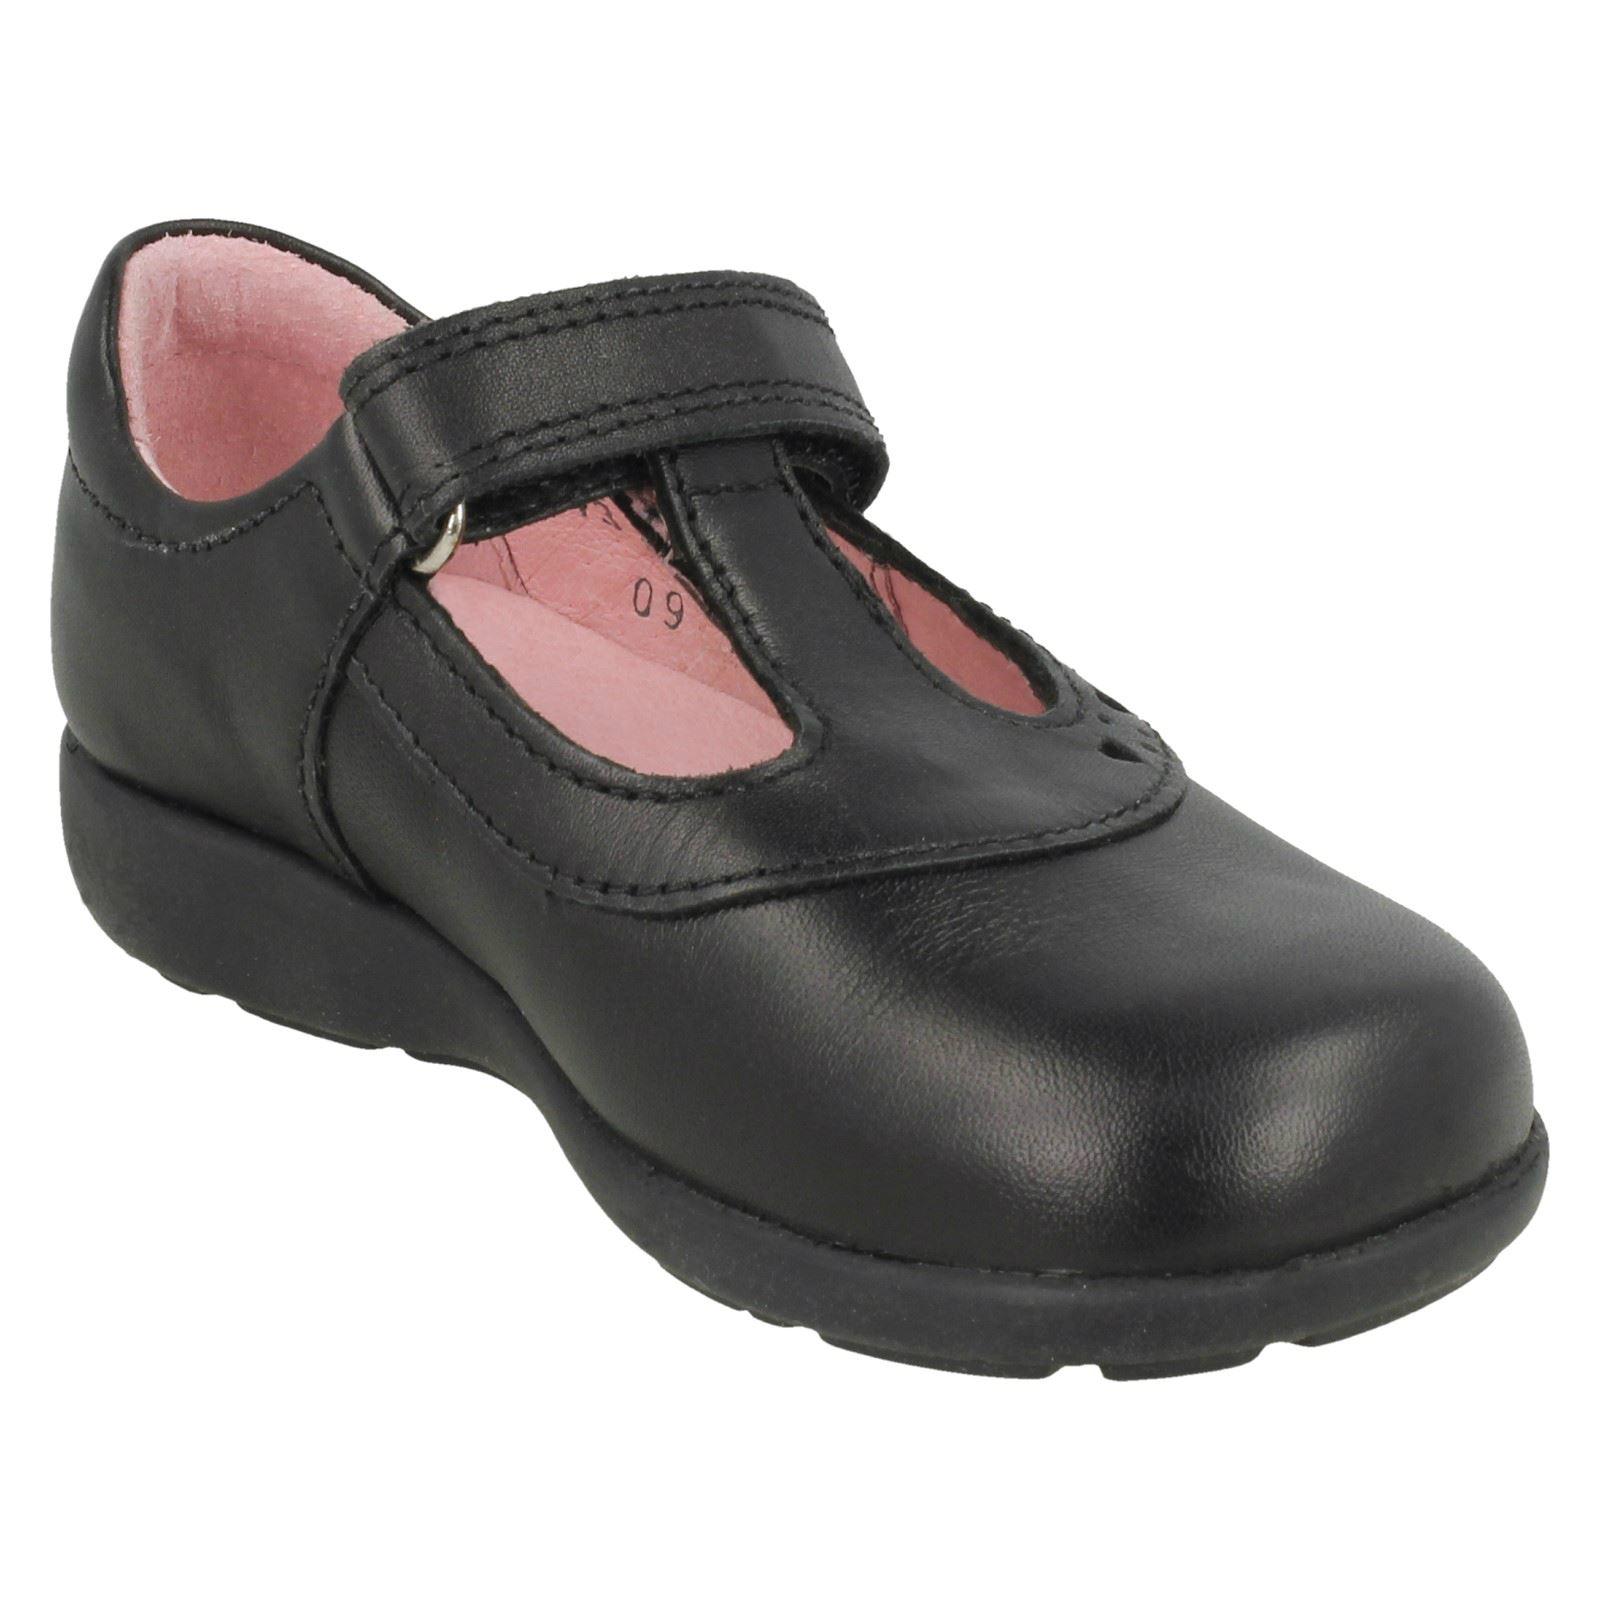 ADIDAS ADISSAGE BADELATSCHEN Badeschuhe Sandalen Schuhe dark